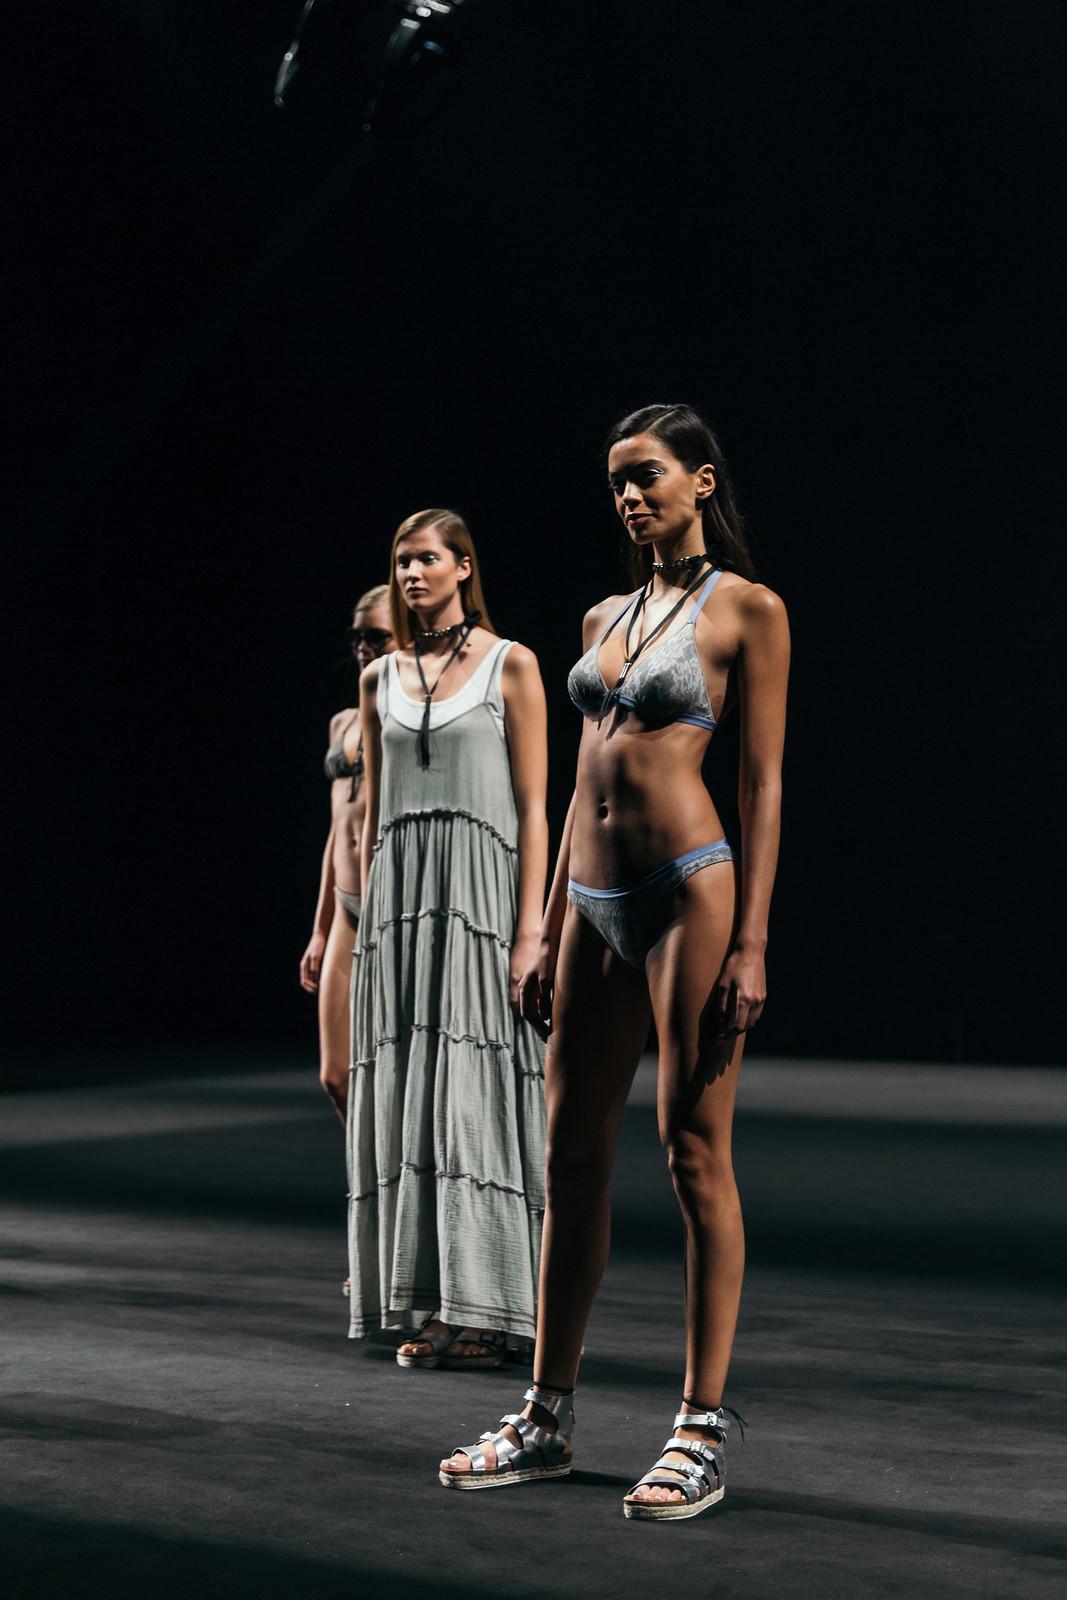 Jessie Chanes - Seams for a desire - 080 Bacelona Fashion #080bcnfasion -40